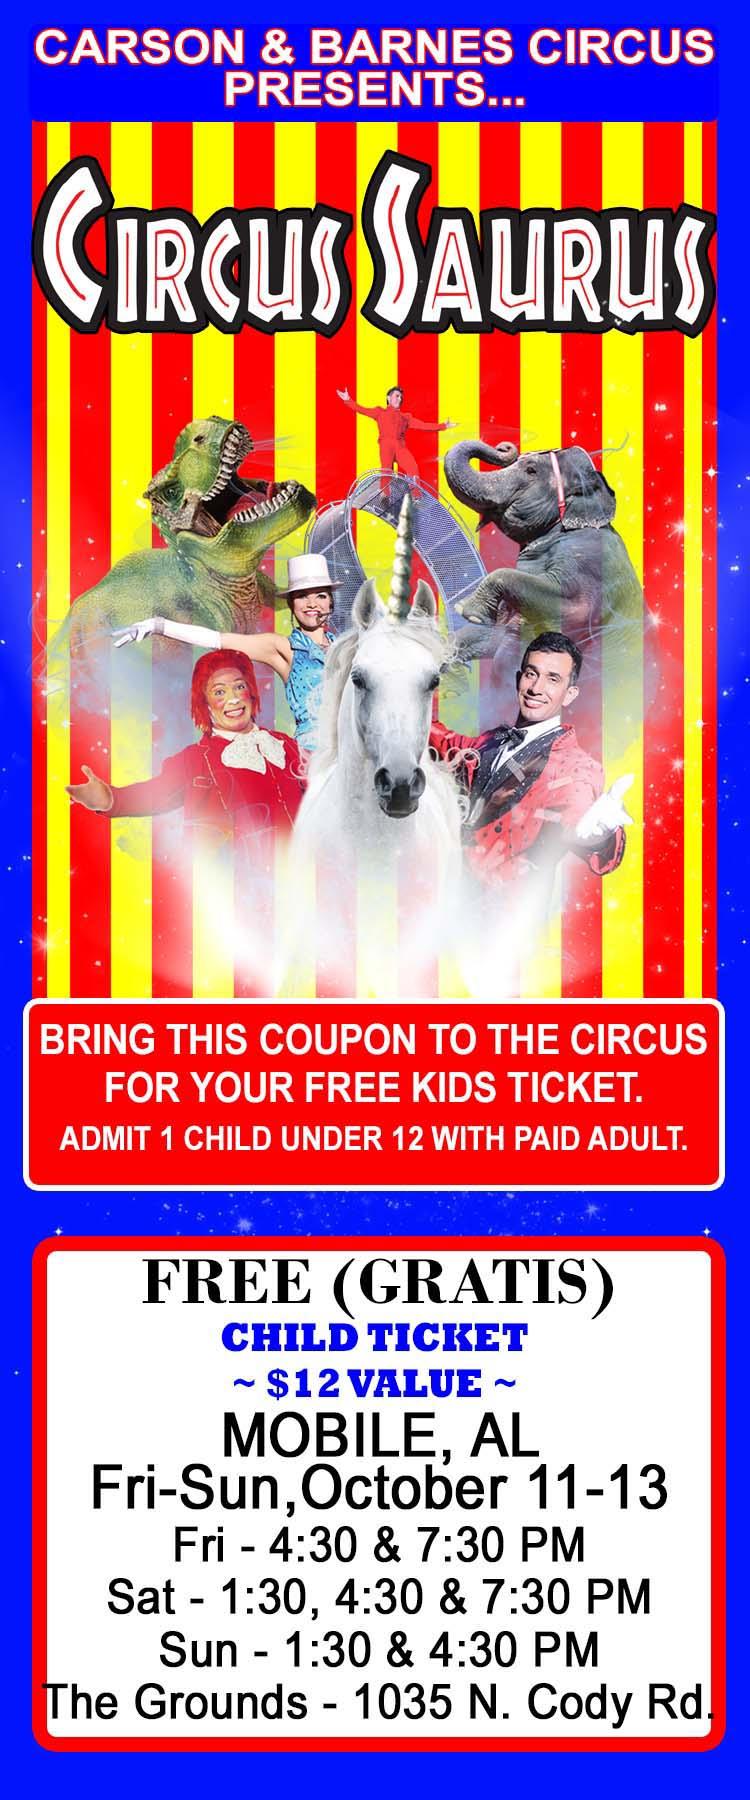 Carson 7 Barnes Circus